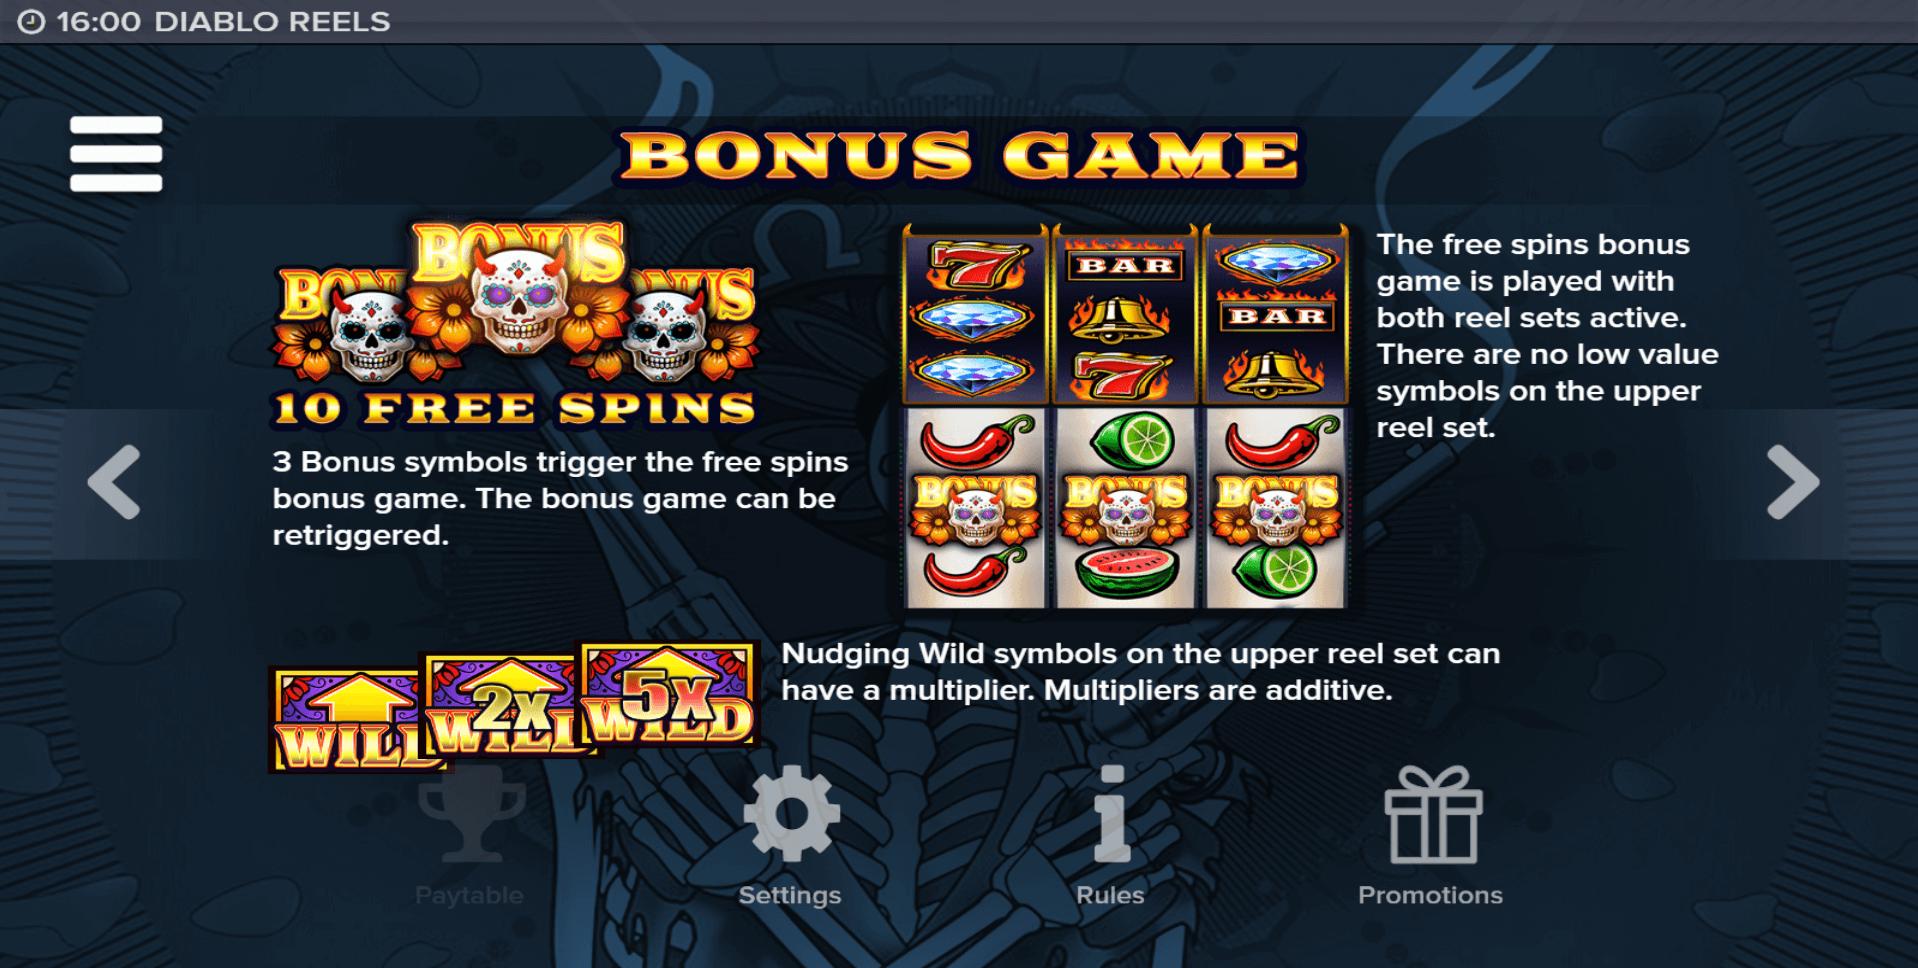 Diablo Reels Slot Machine